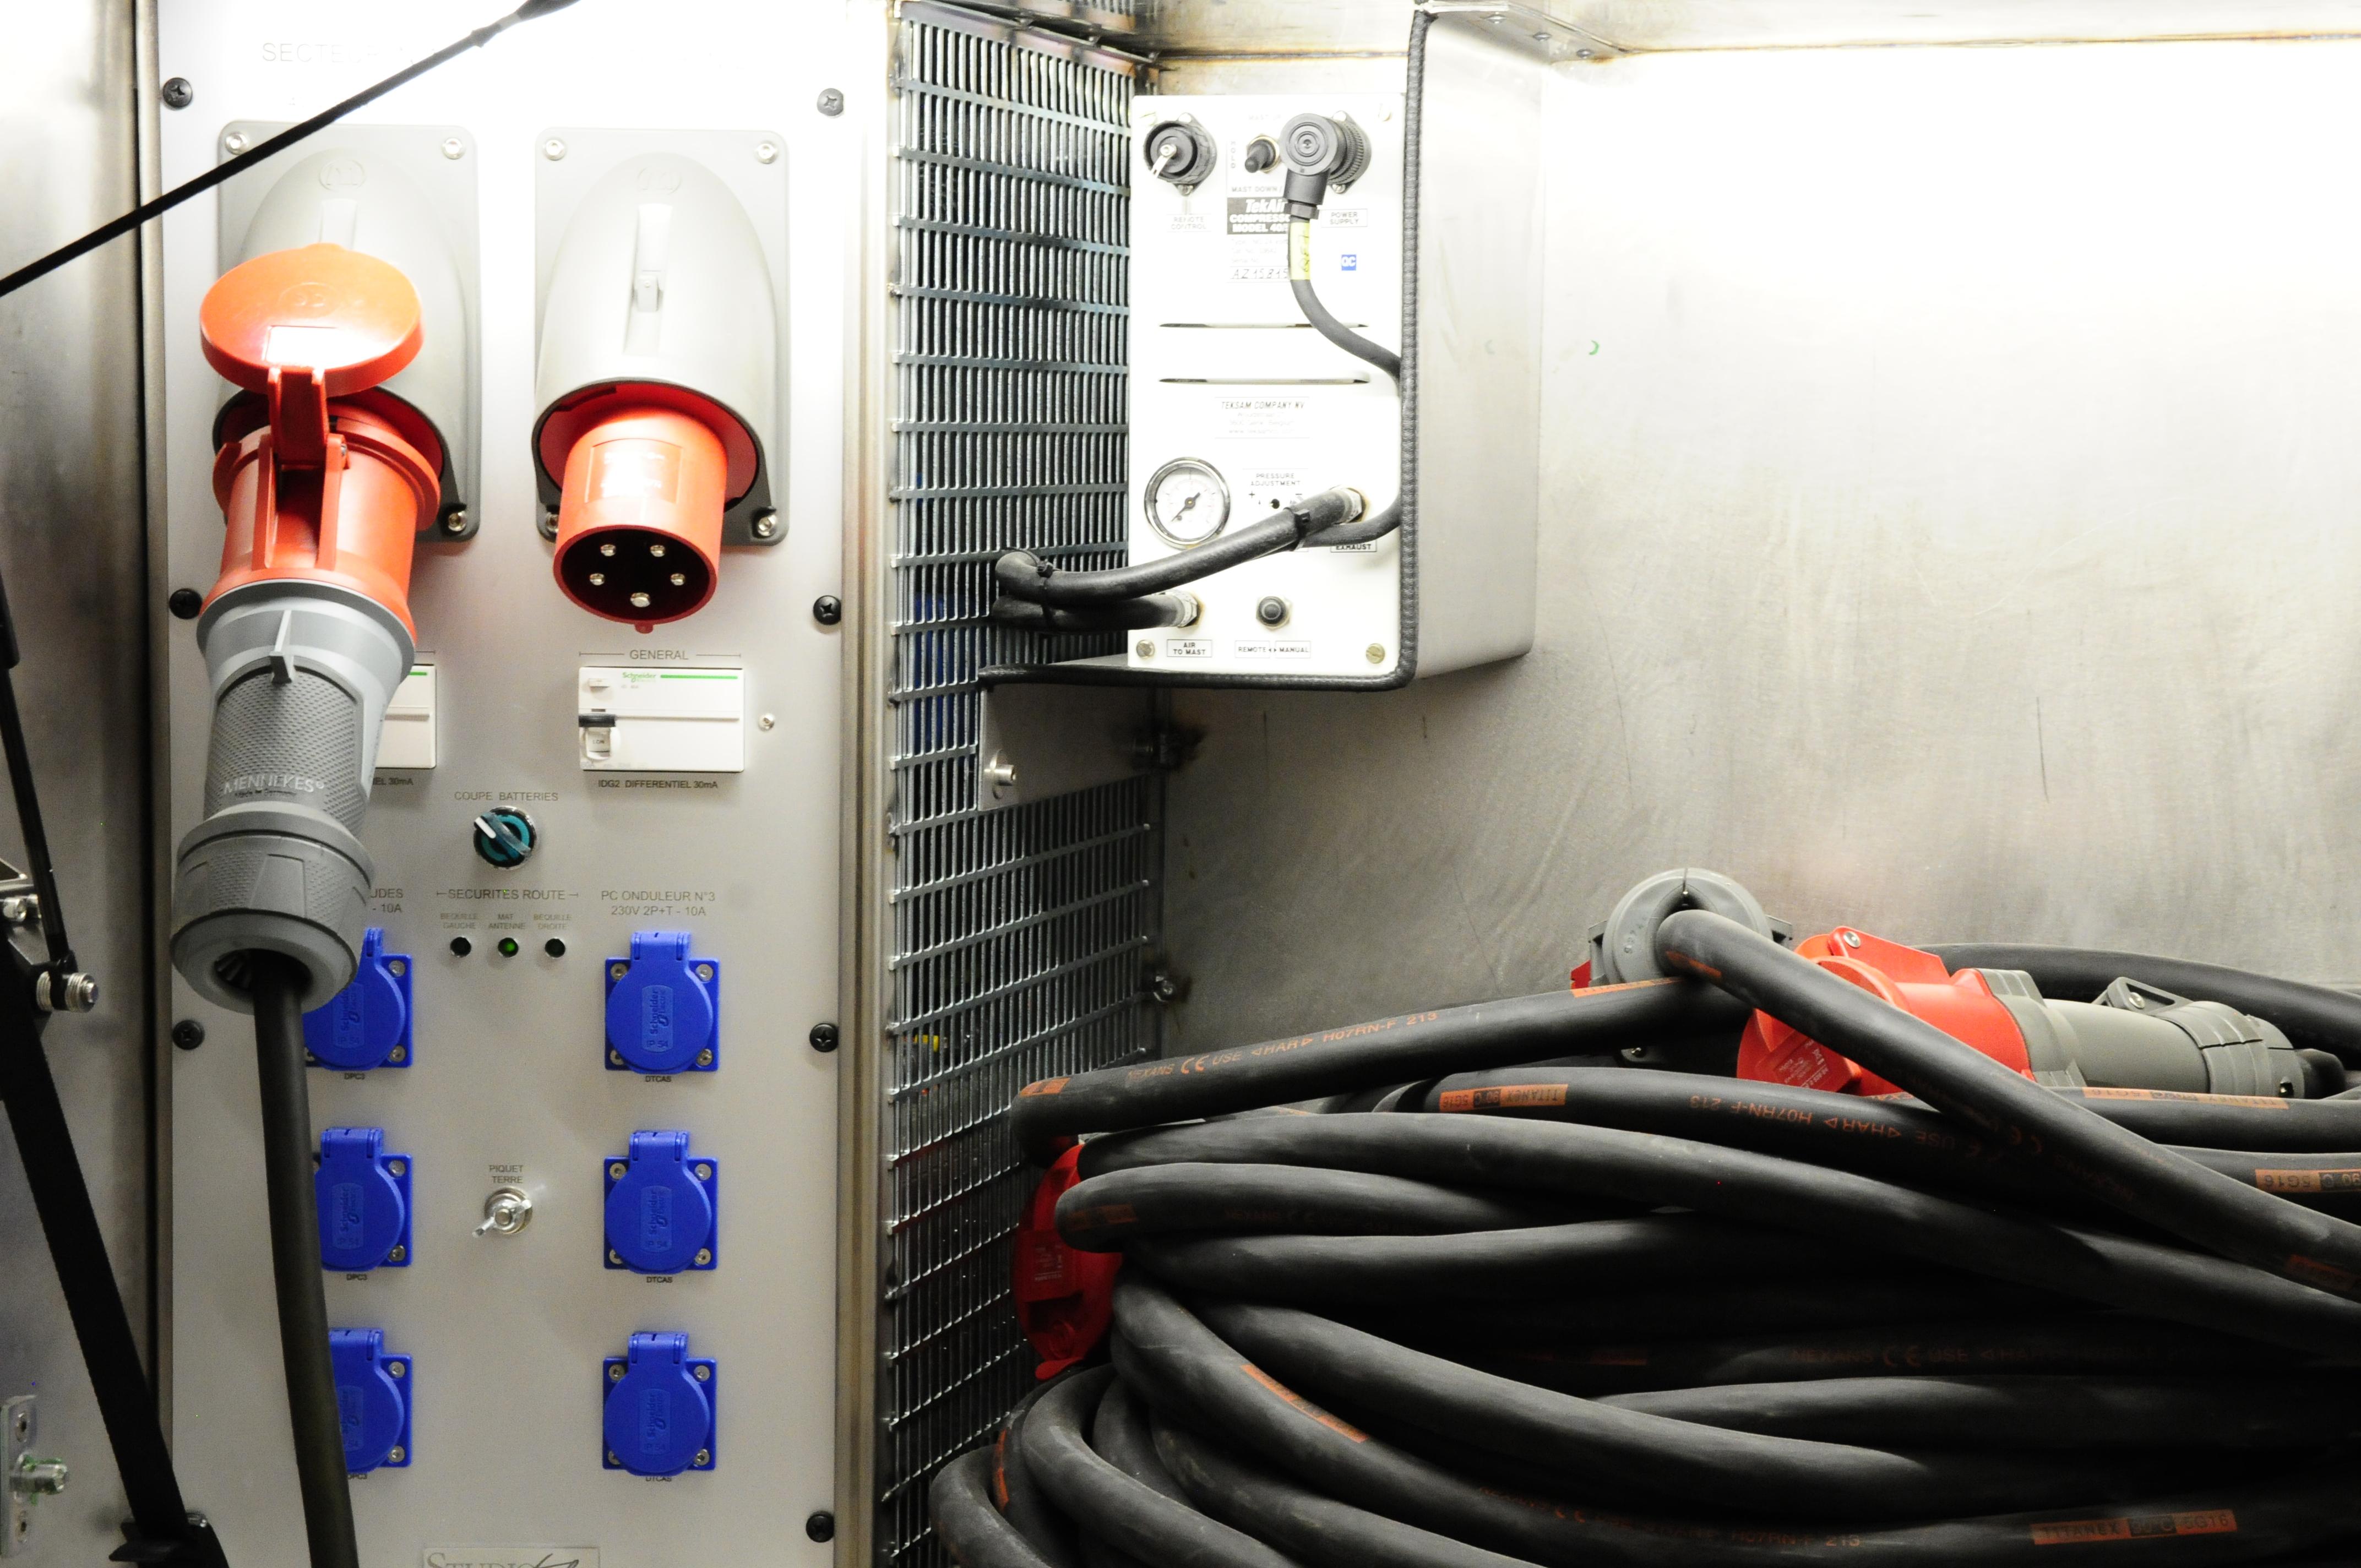 External power supply & mast compressor.